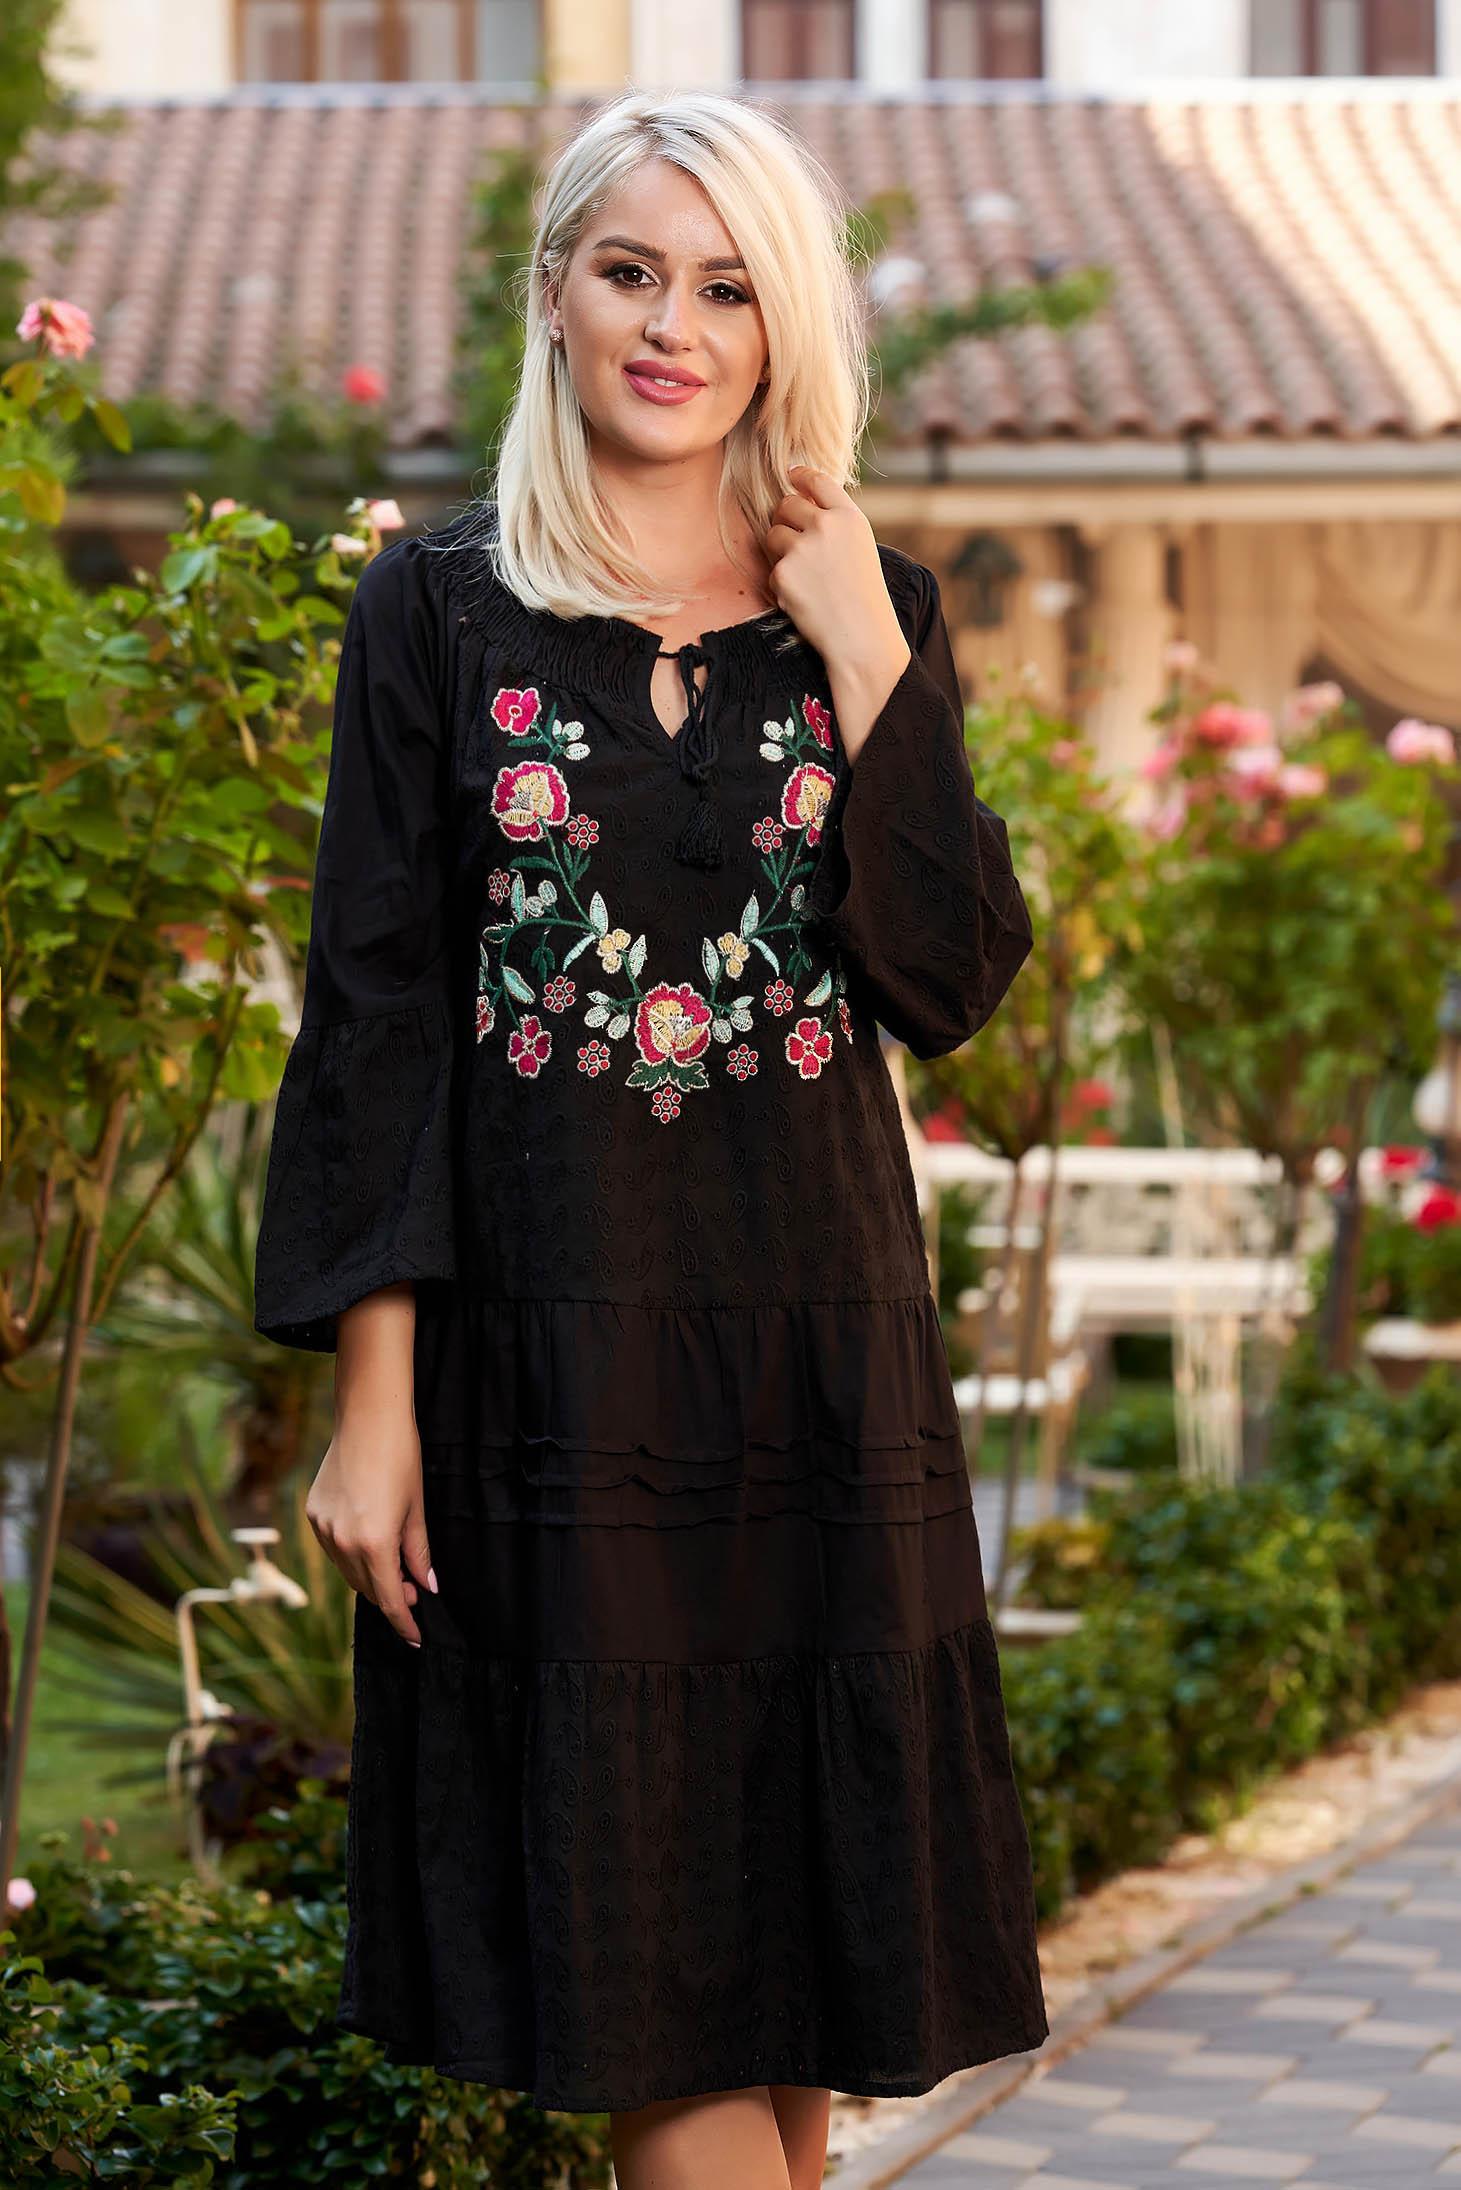 Rochie neagra de zi midi din bumbac cu croi larg broderie florala cu maneci lungi pe umeri